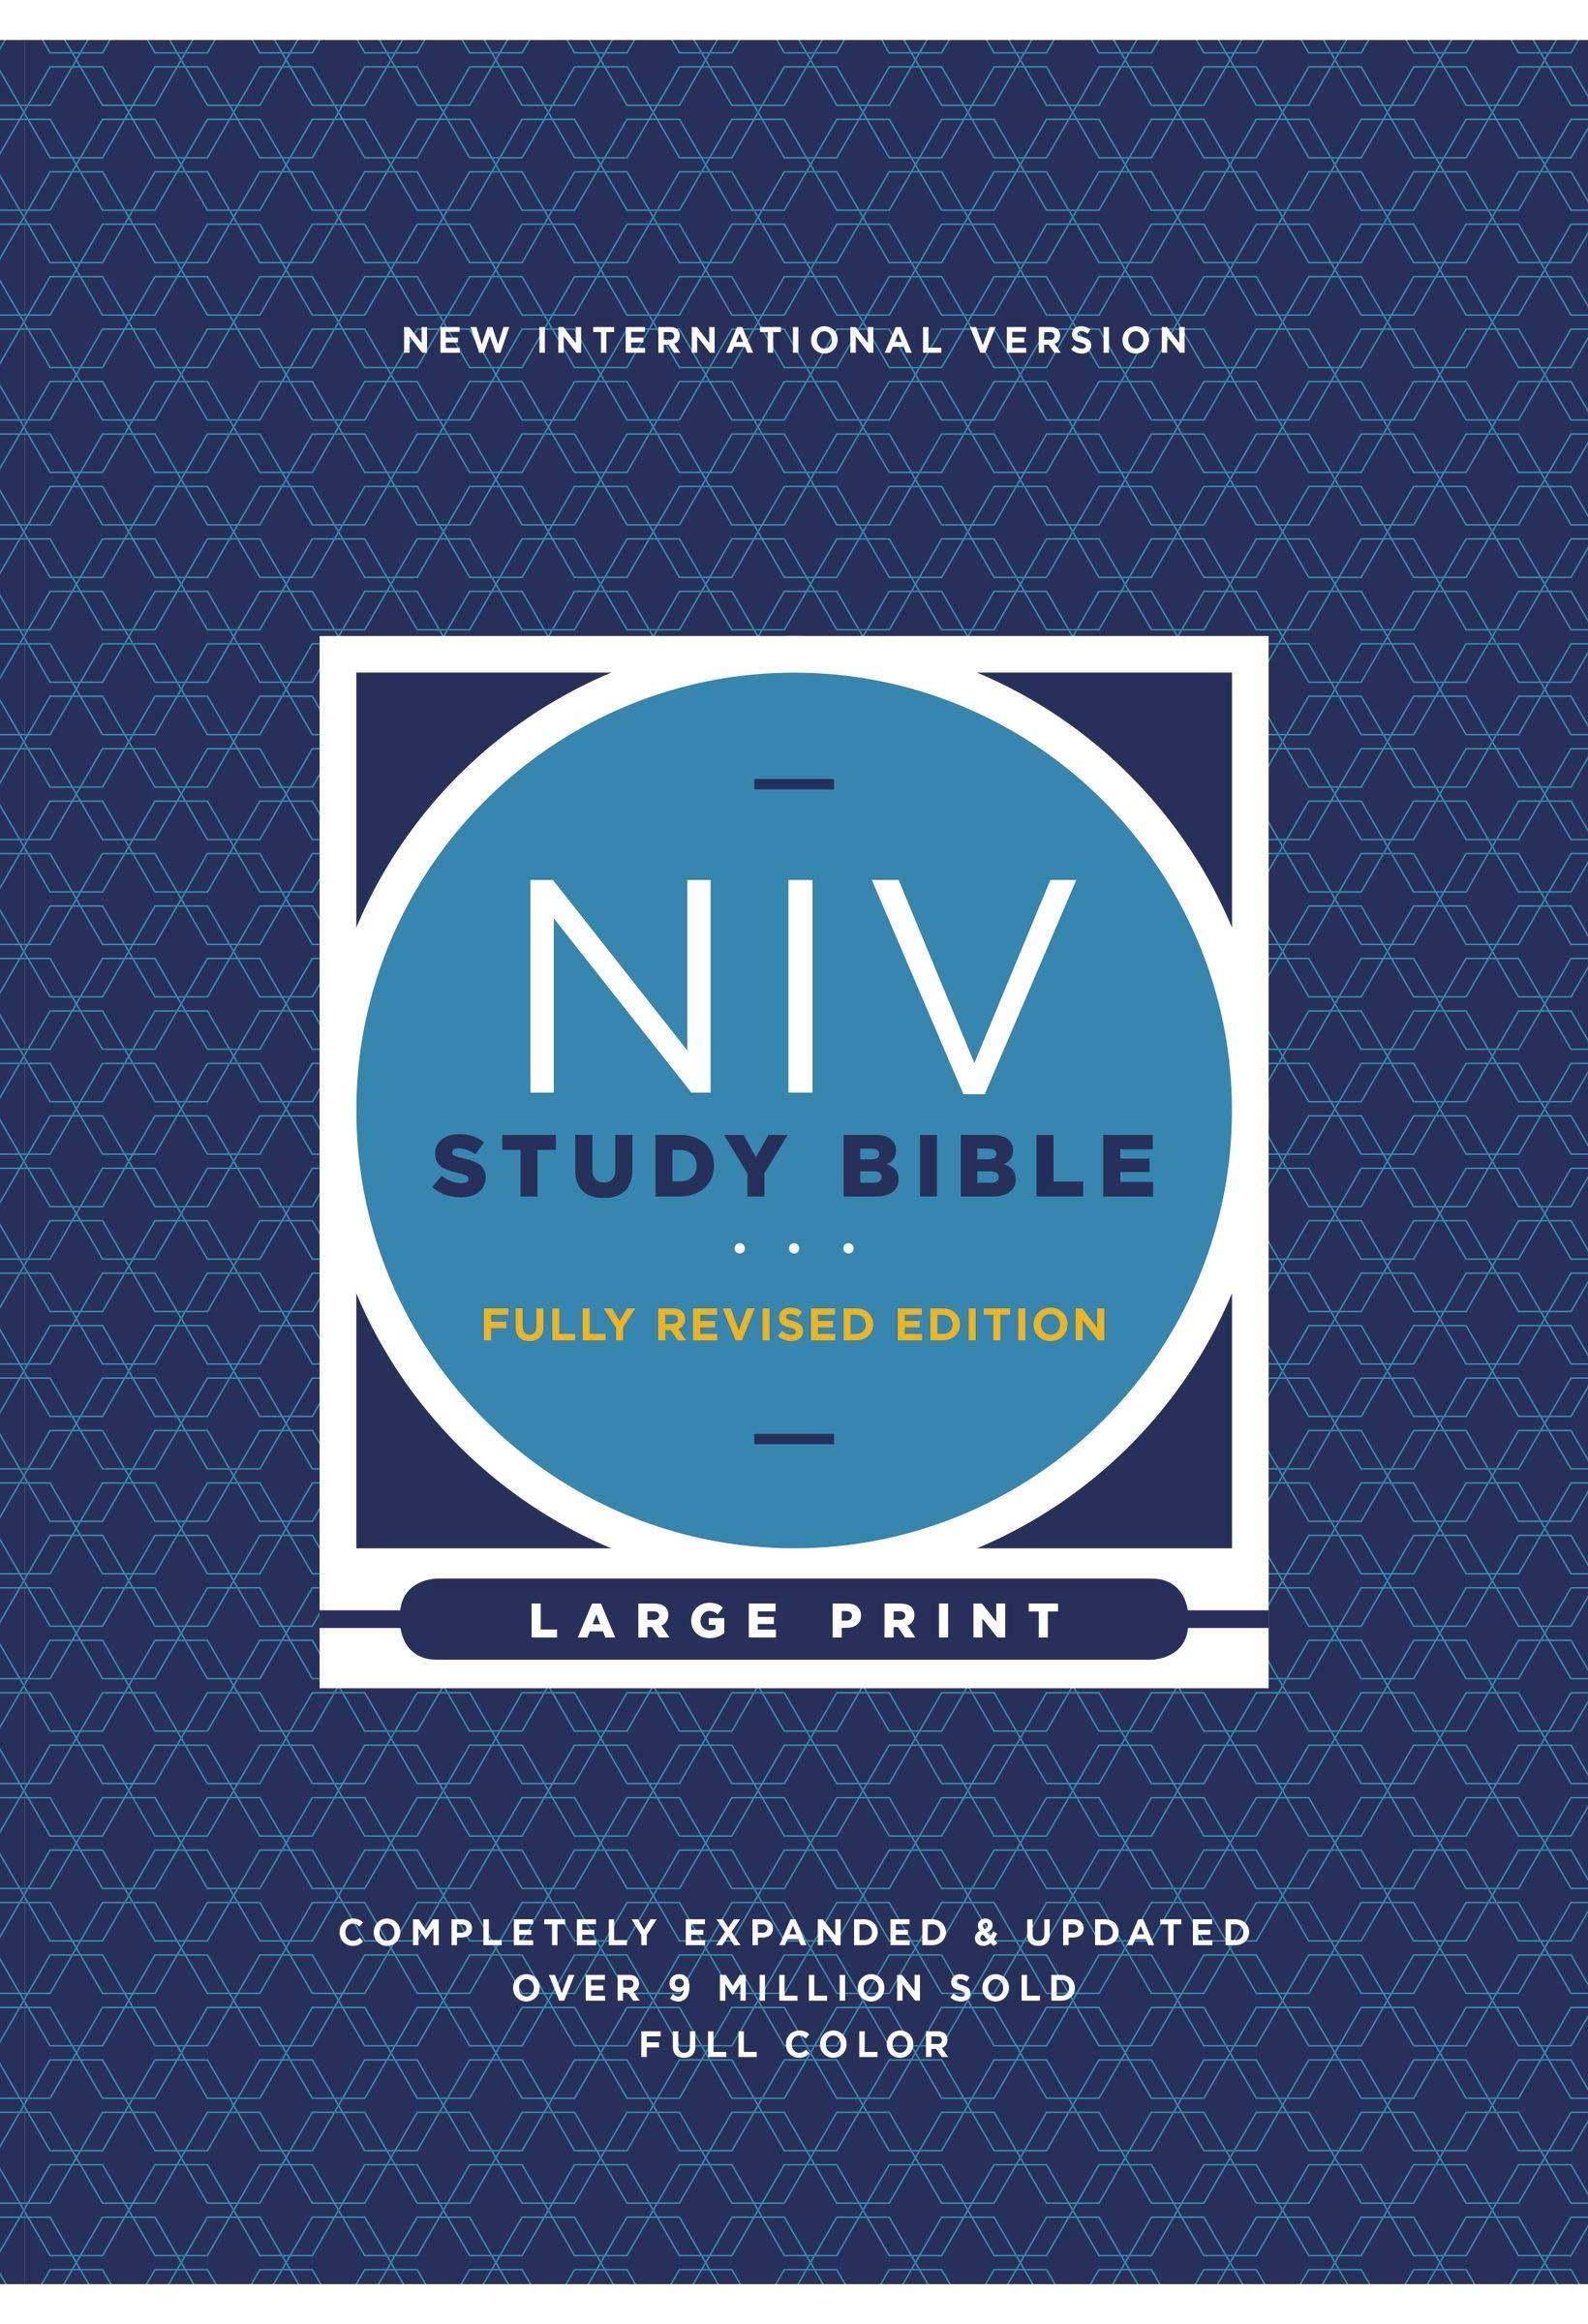 NIV STUDY BIBLE LARGE PRINT